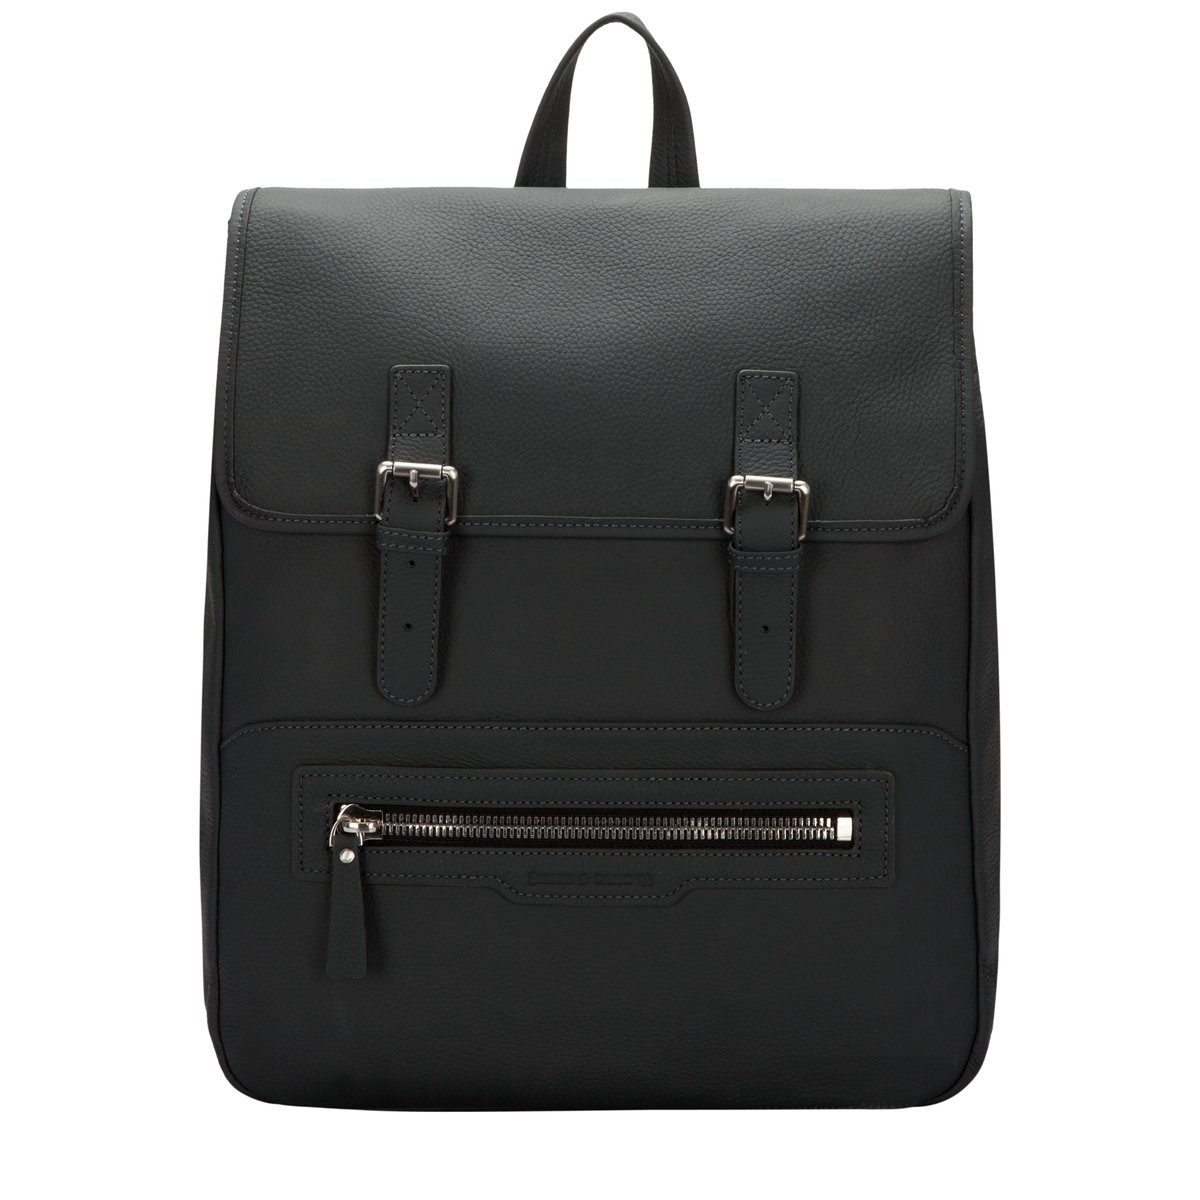 323d4f5d1fbf Flapover Buckle Detail Backpack - Smith   Canova